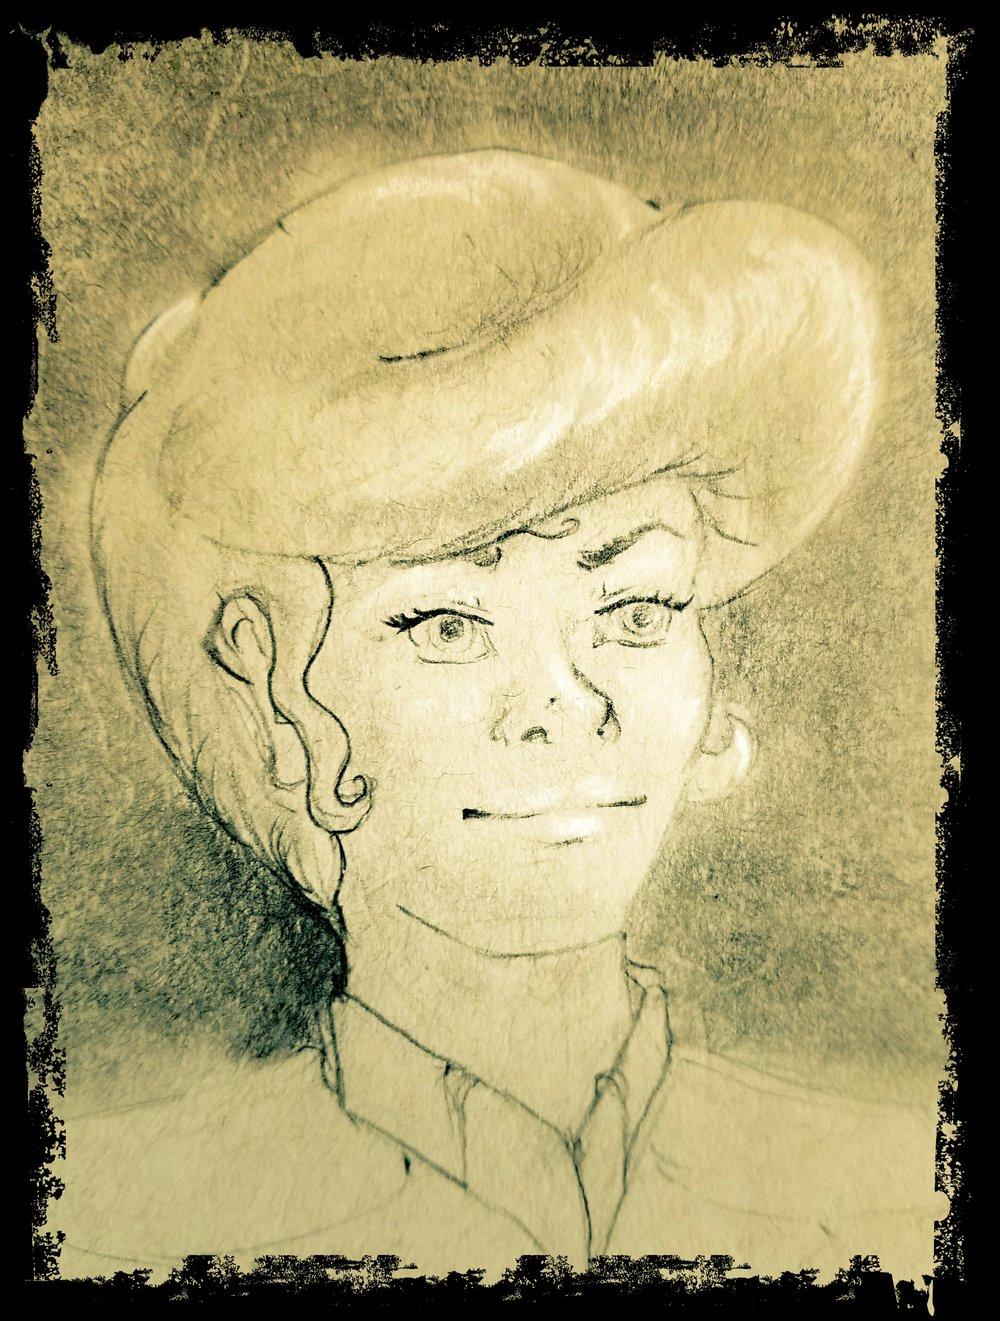 Rose Worthington portrait done by  Stylus